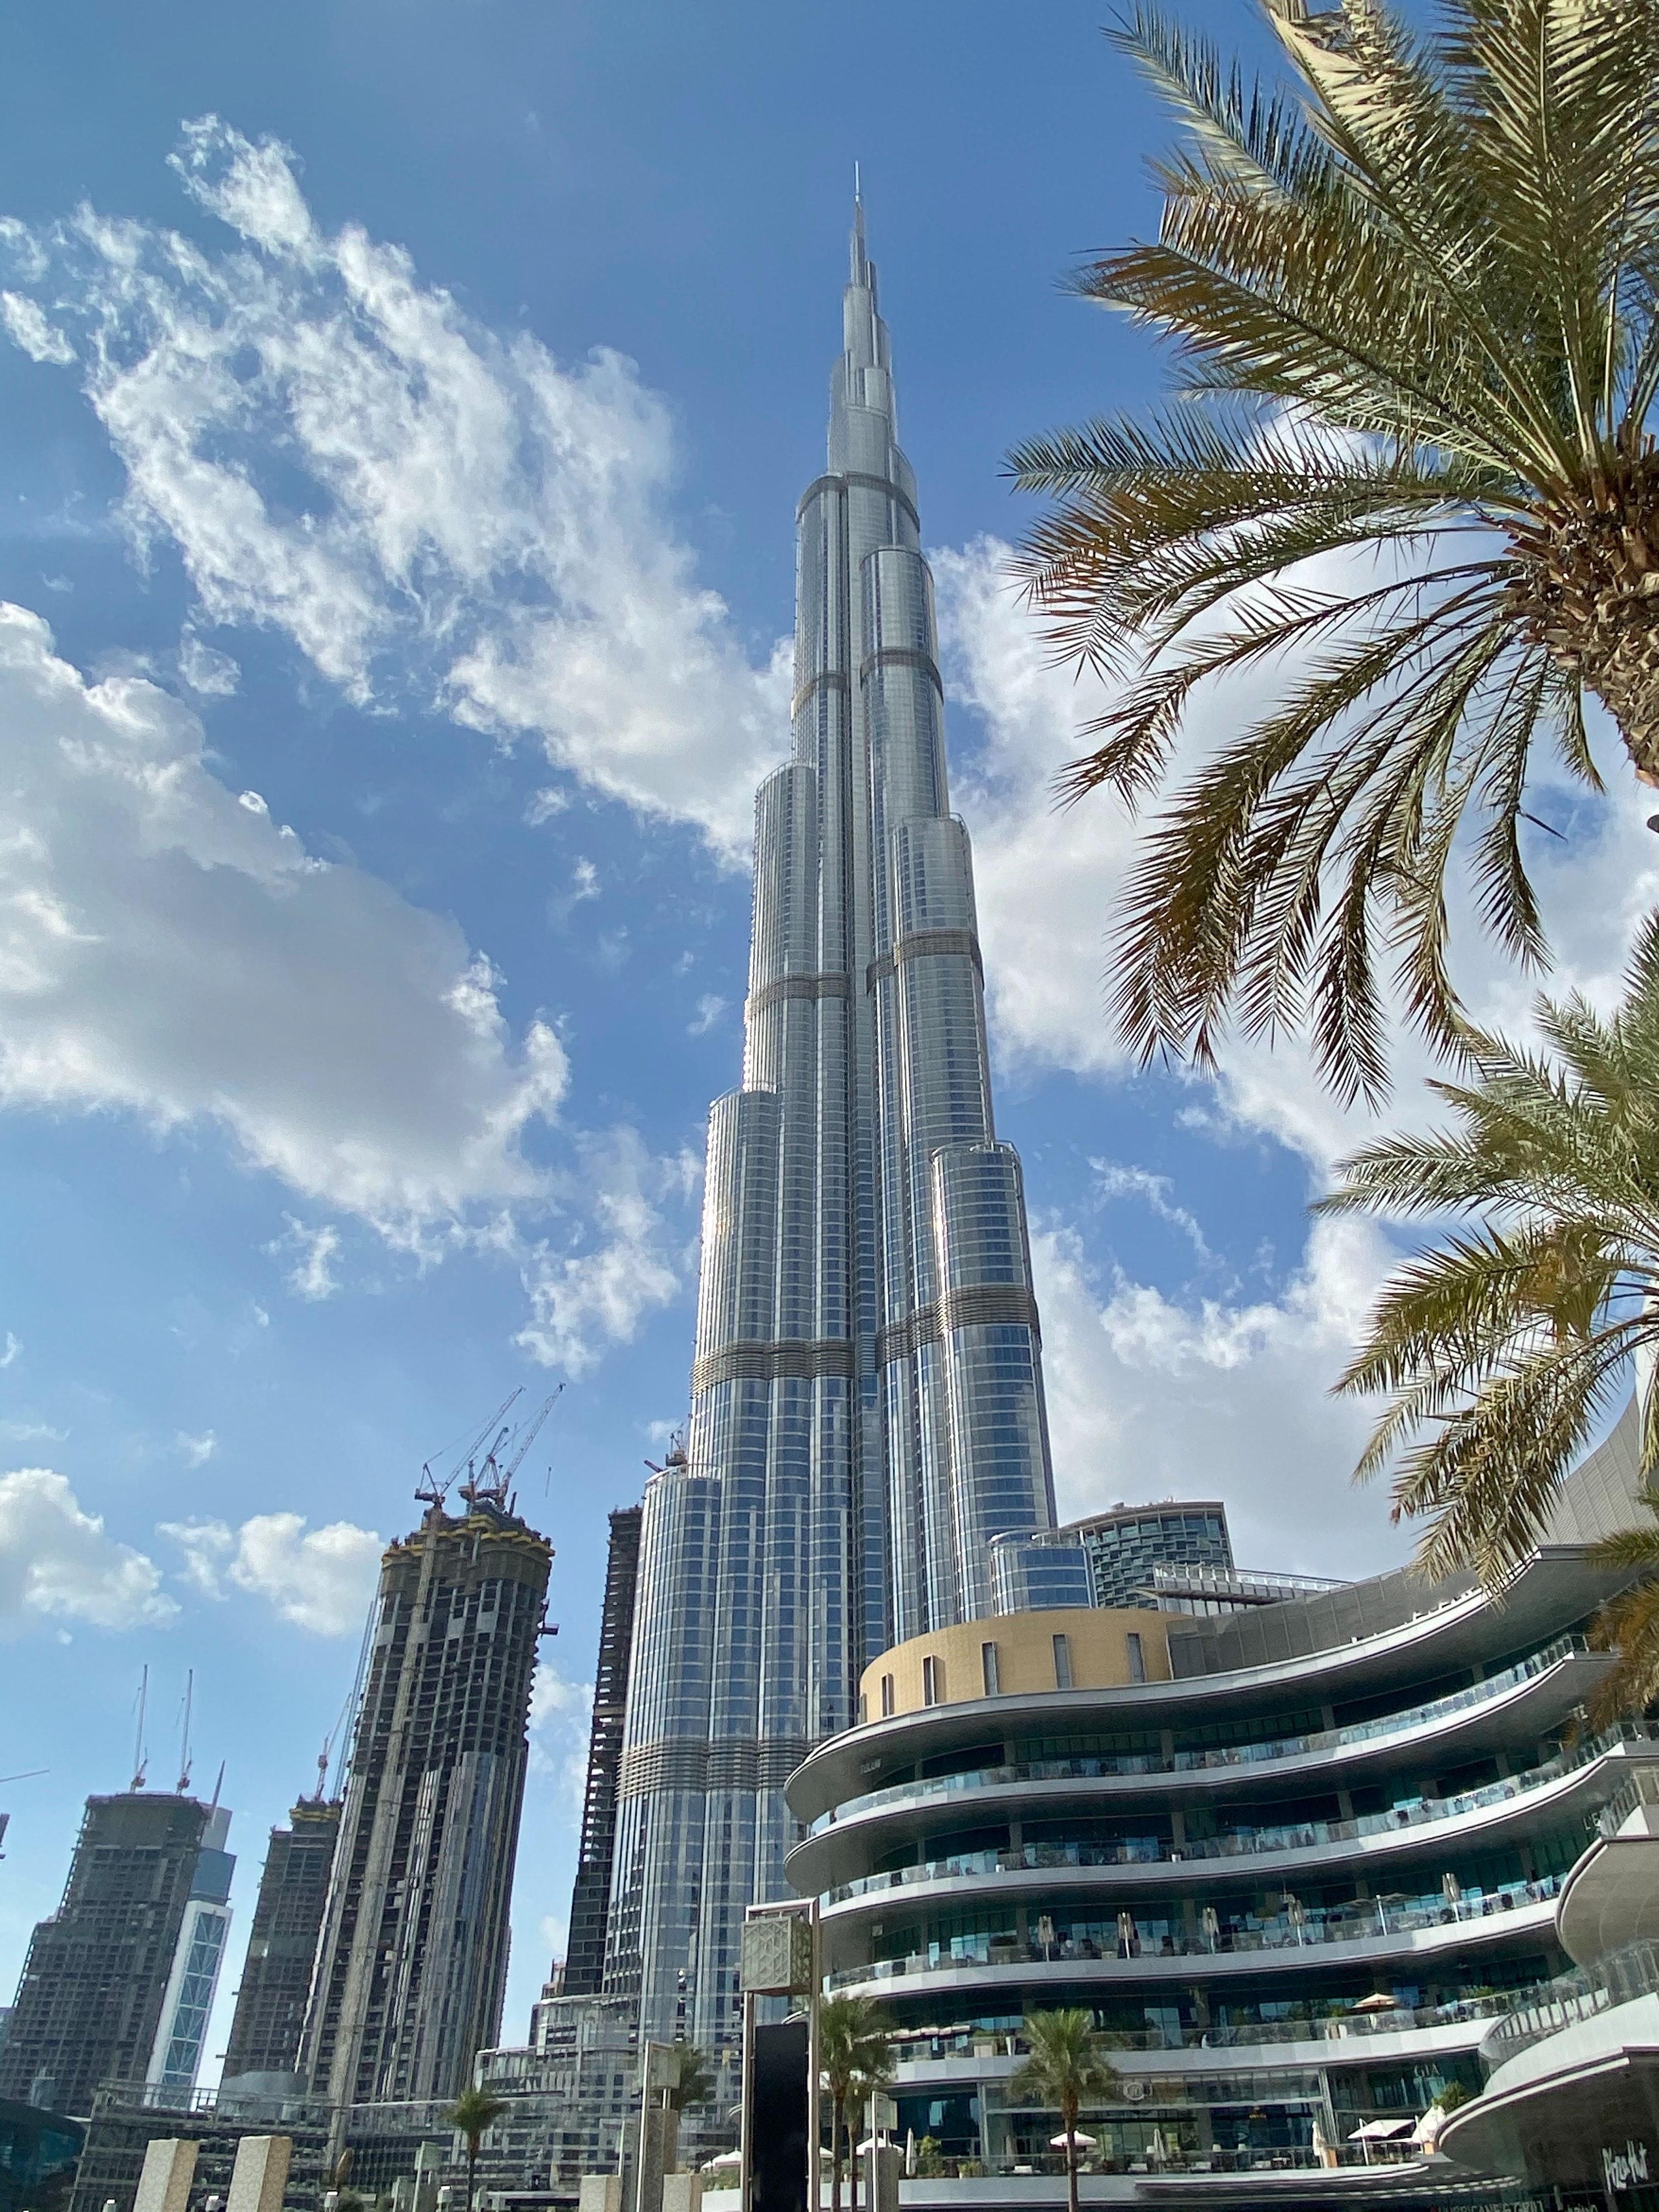 Best Places to Visit in Dubai - Burj khalifa - 3